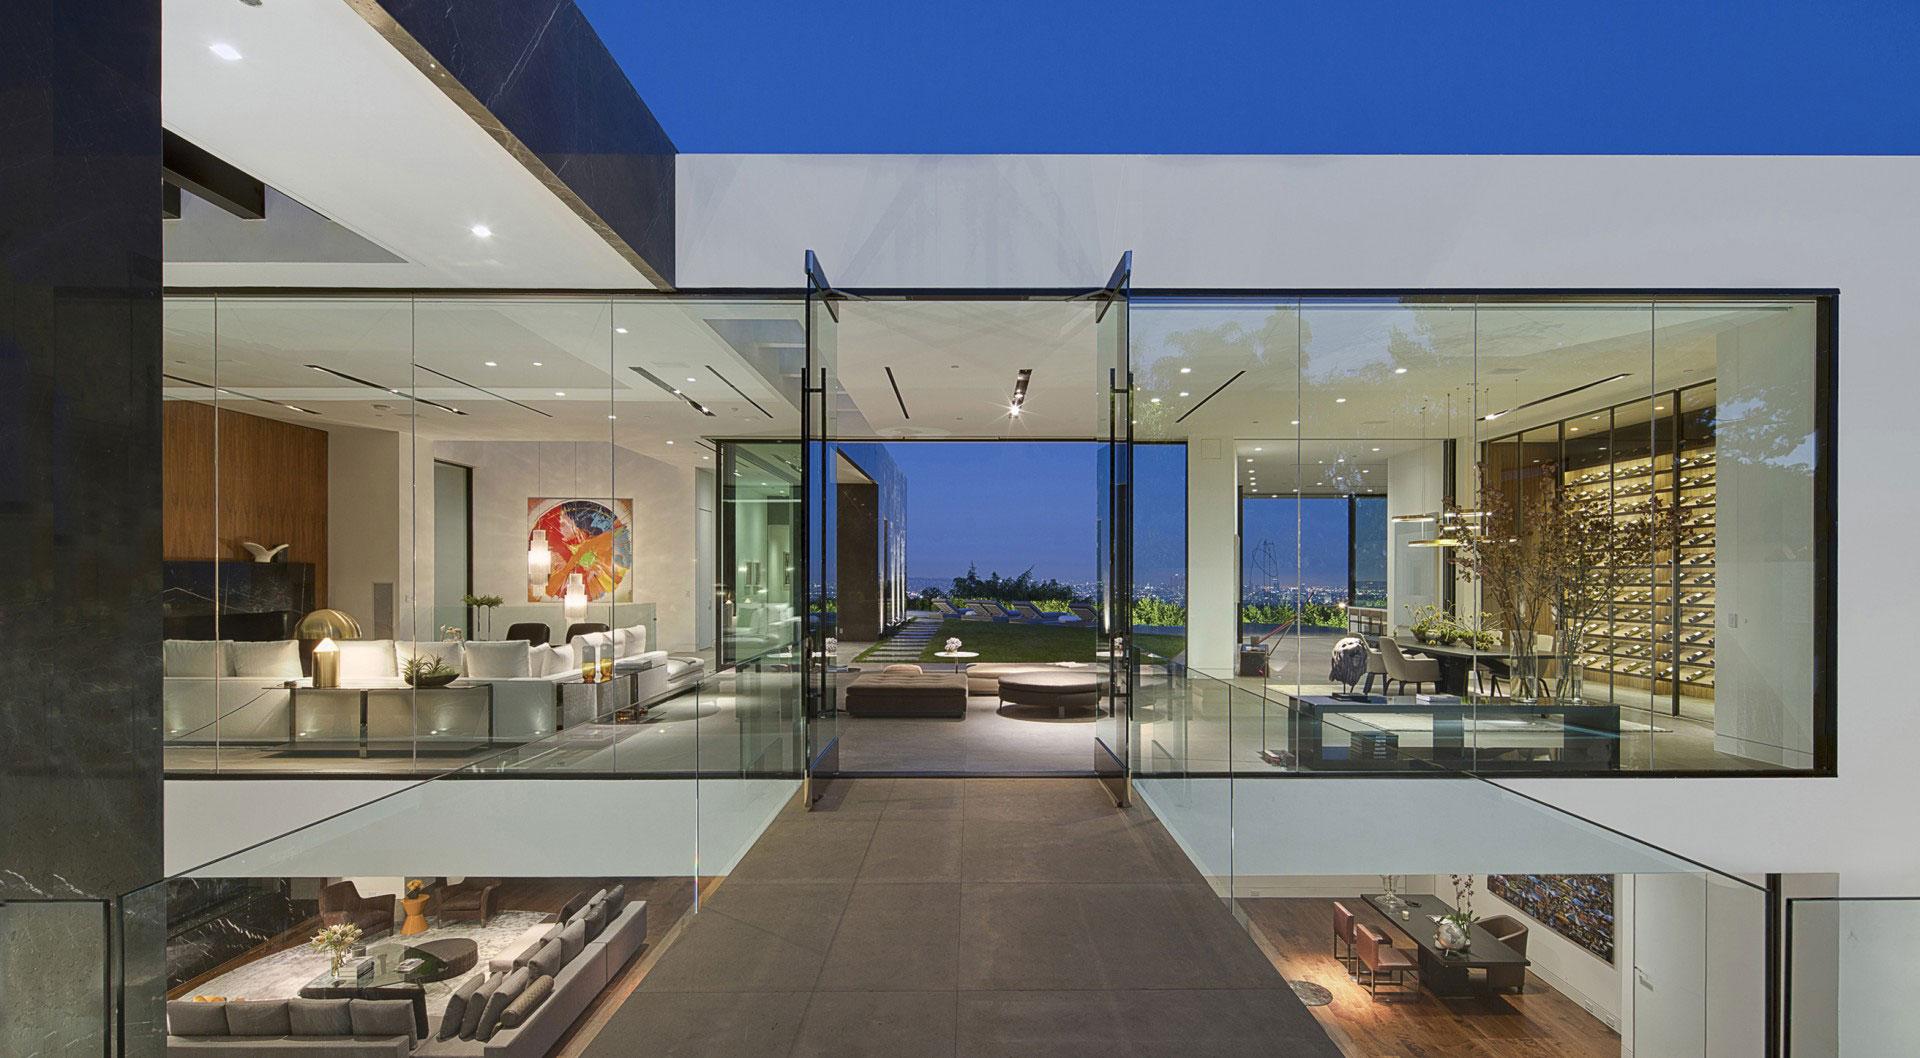 Glasshousedesign Interior Design Also Glasshousedesign Architectures Photo House Designing Lemore Homes